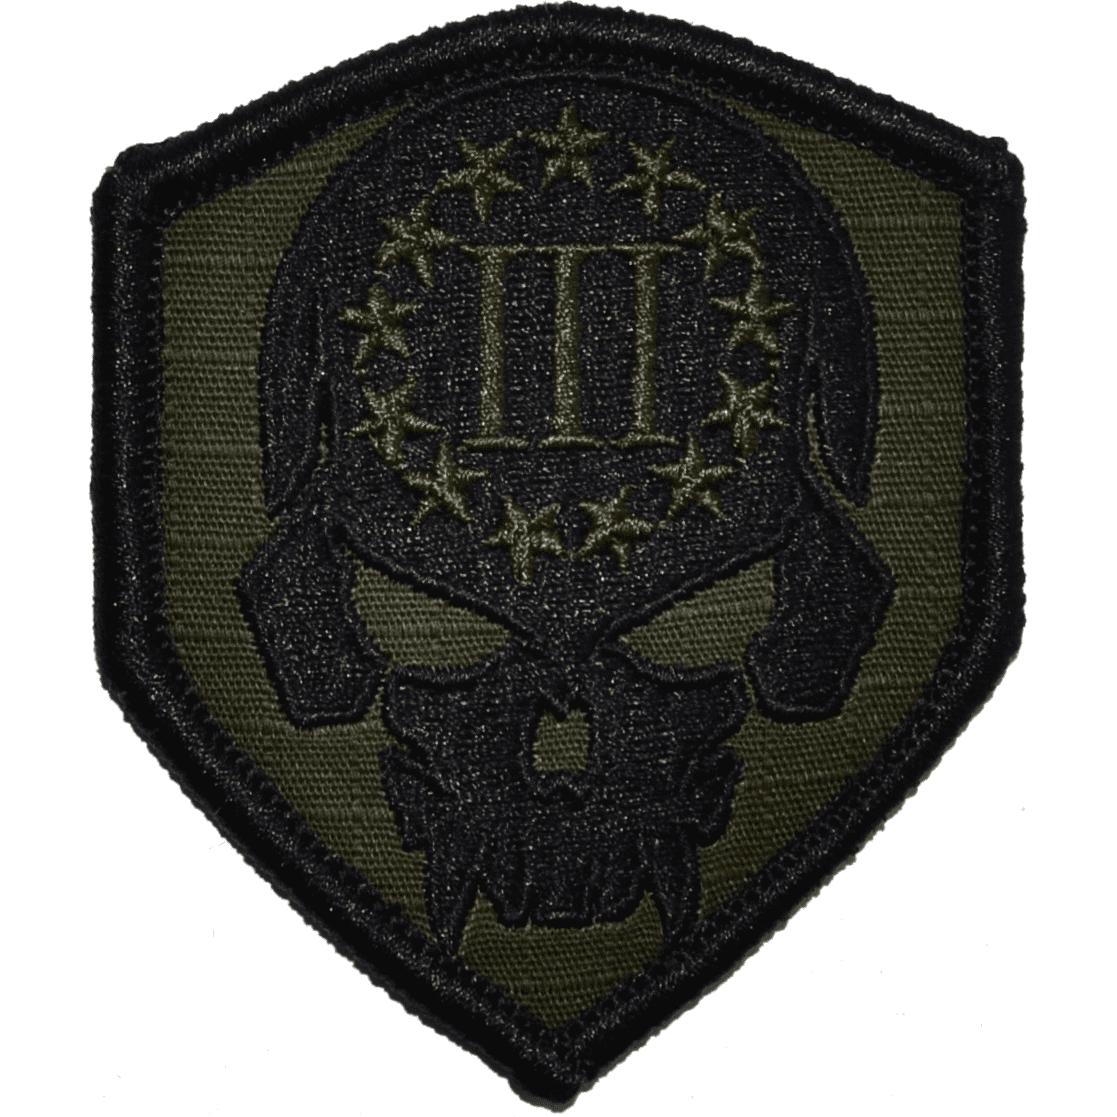 3 Percenter Skull - 2.5x3 Shield Patch